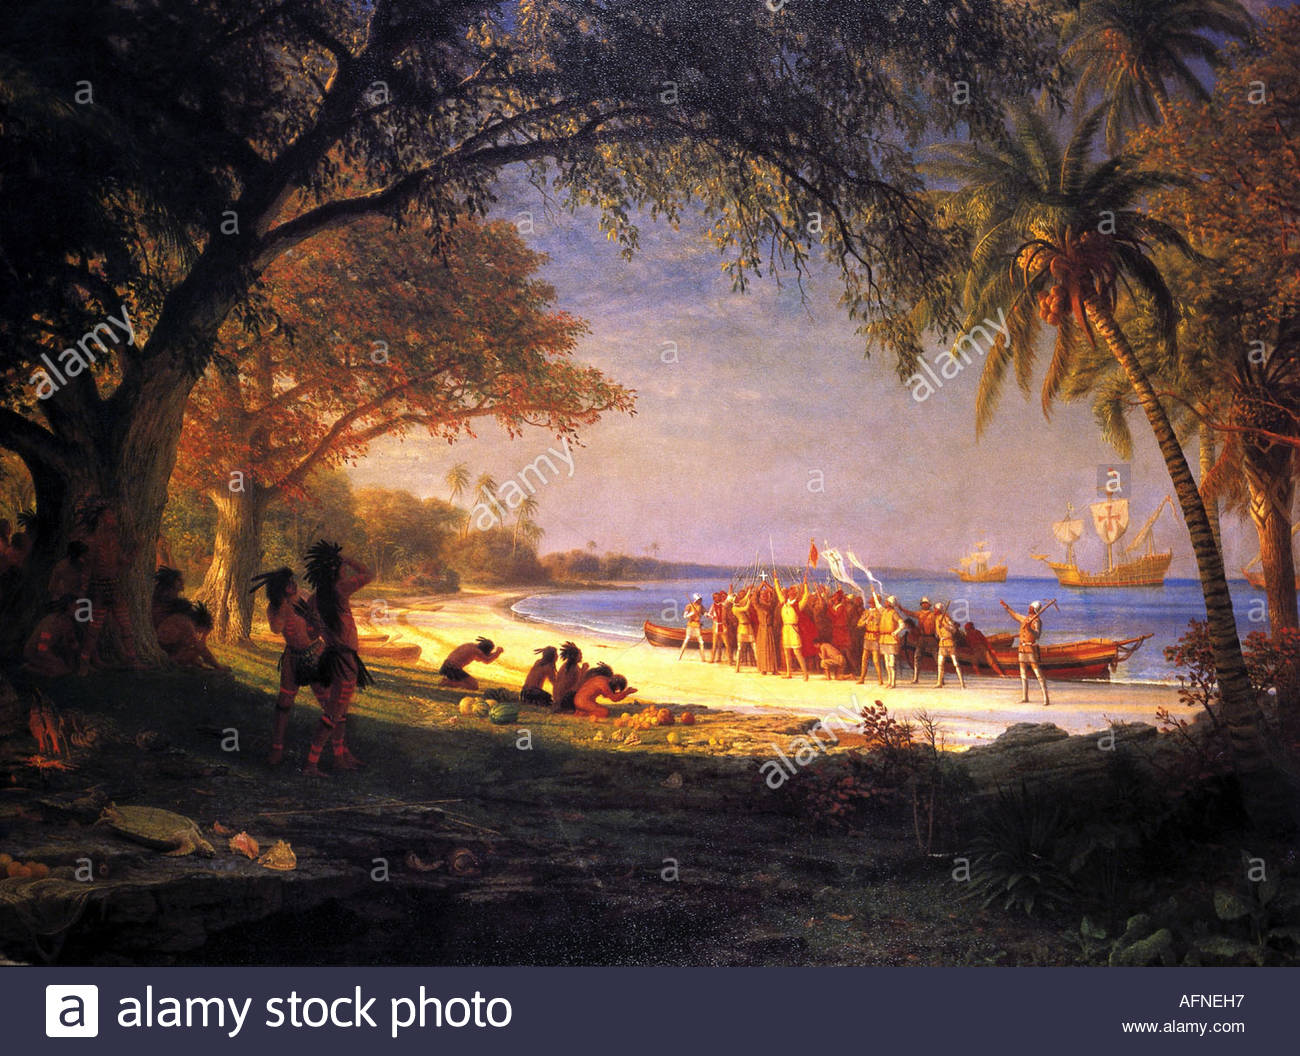 Columbus, Christopher, 1451 - 20.5.1506, italienische Entdecker, Szene, Ankunft am Guanahani, 12.10.1492, Historienmalerei, Stockbild